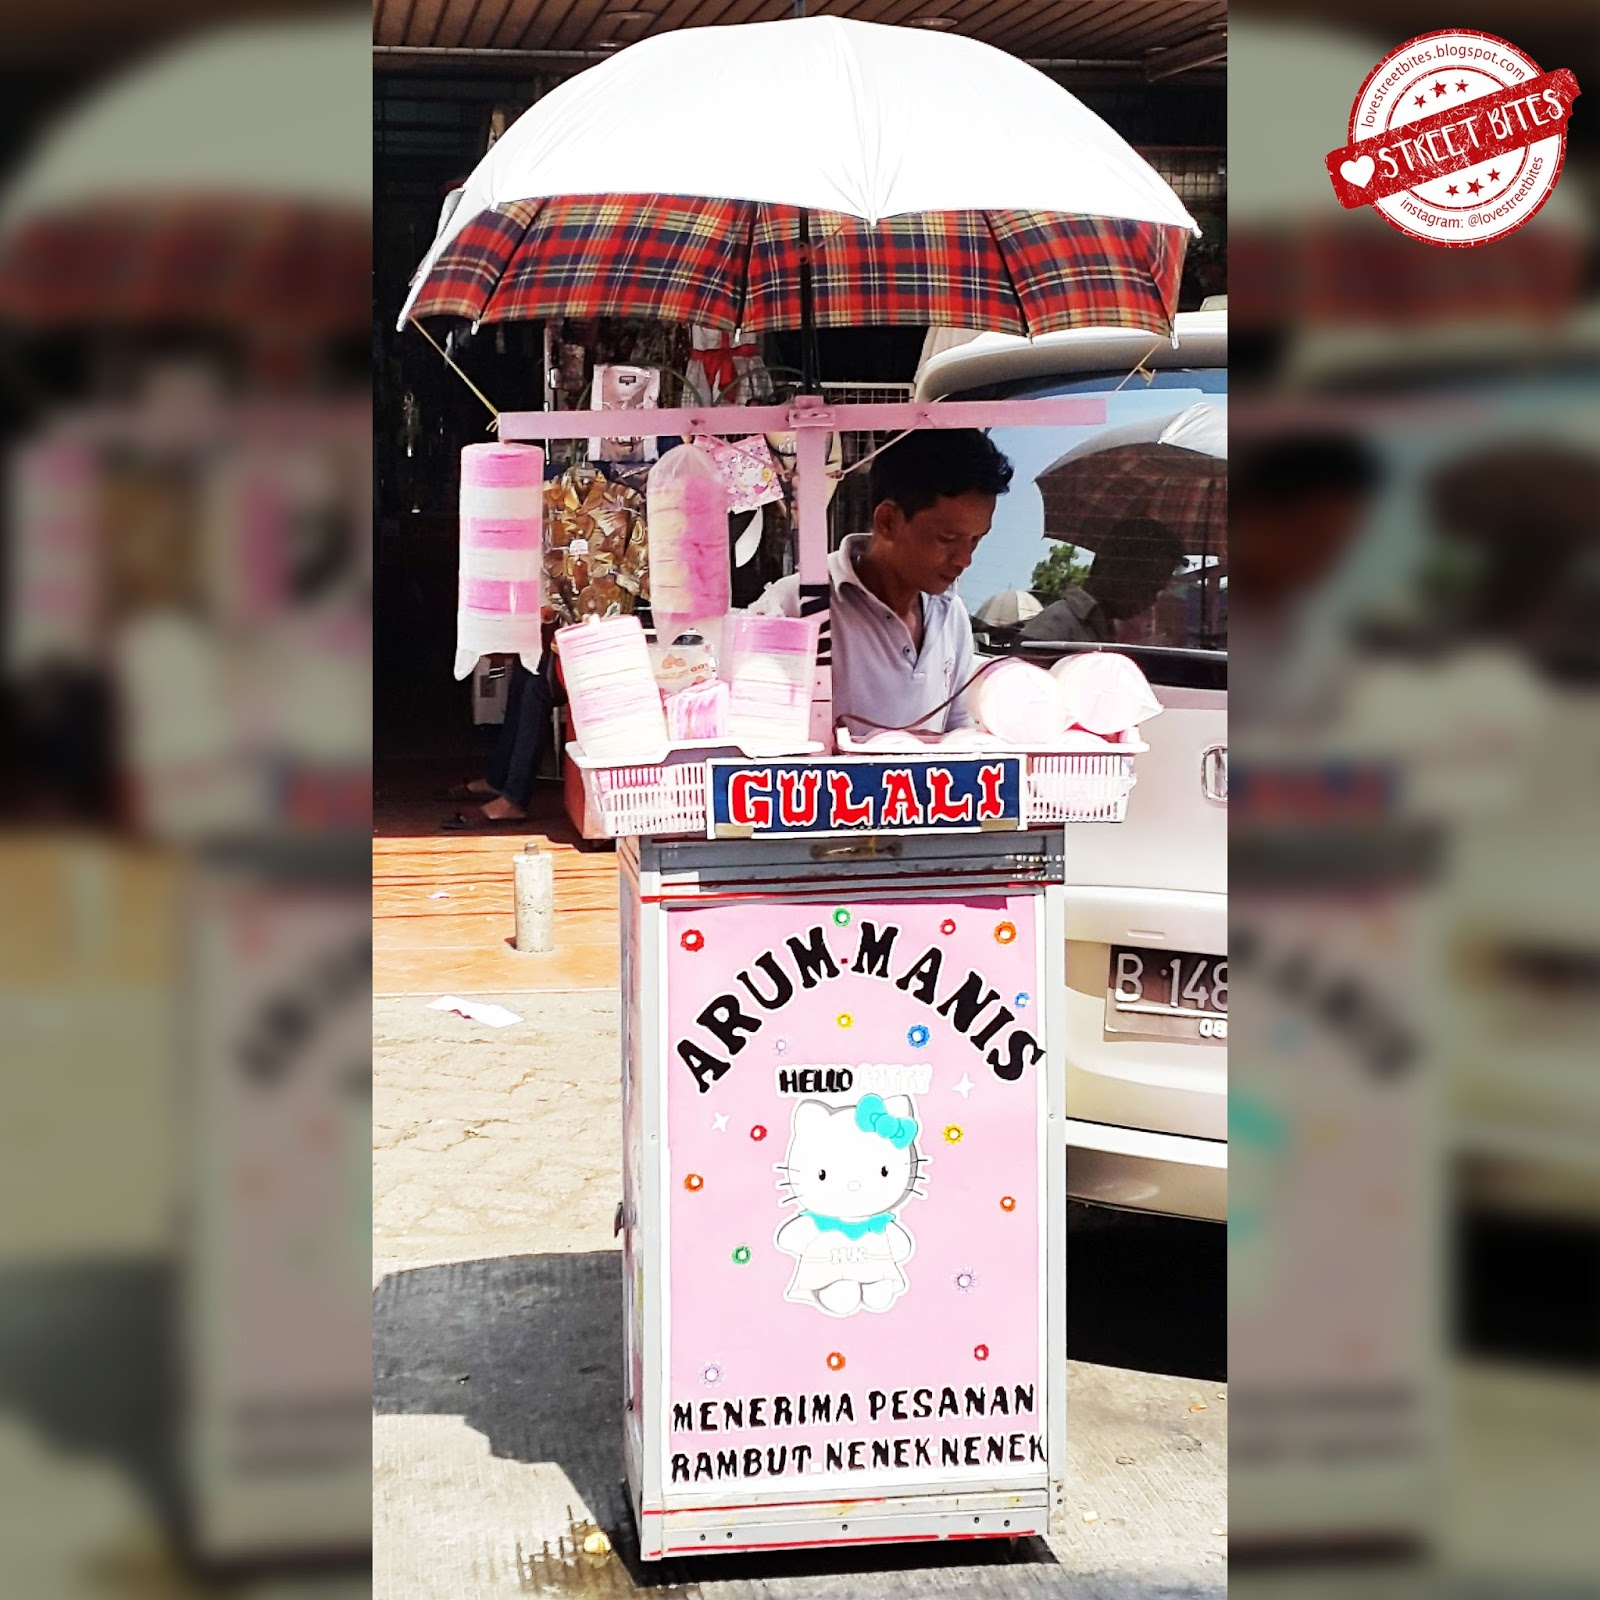 Love Street Bites Arum Manis Gulali Mayestik Jalan Tebah Iii Rambut Nenek The Colorful Cart At Kebayoran Baru Jakarta Selatan